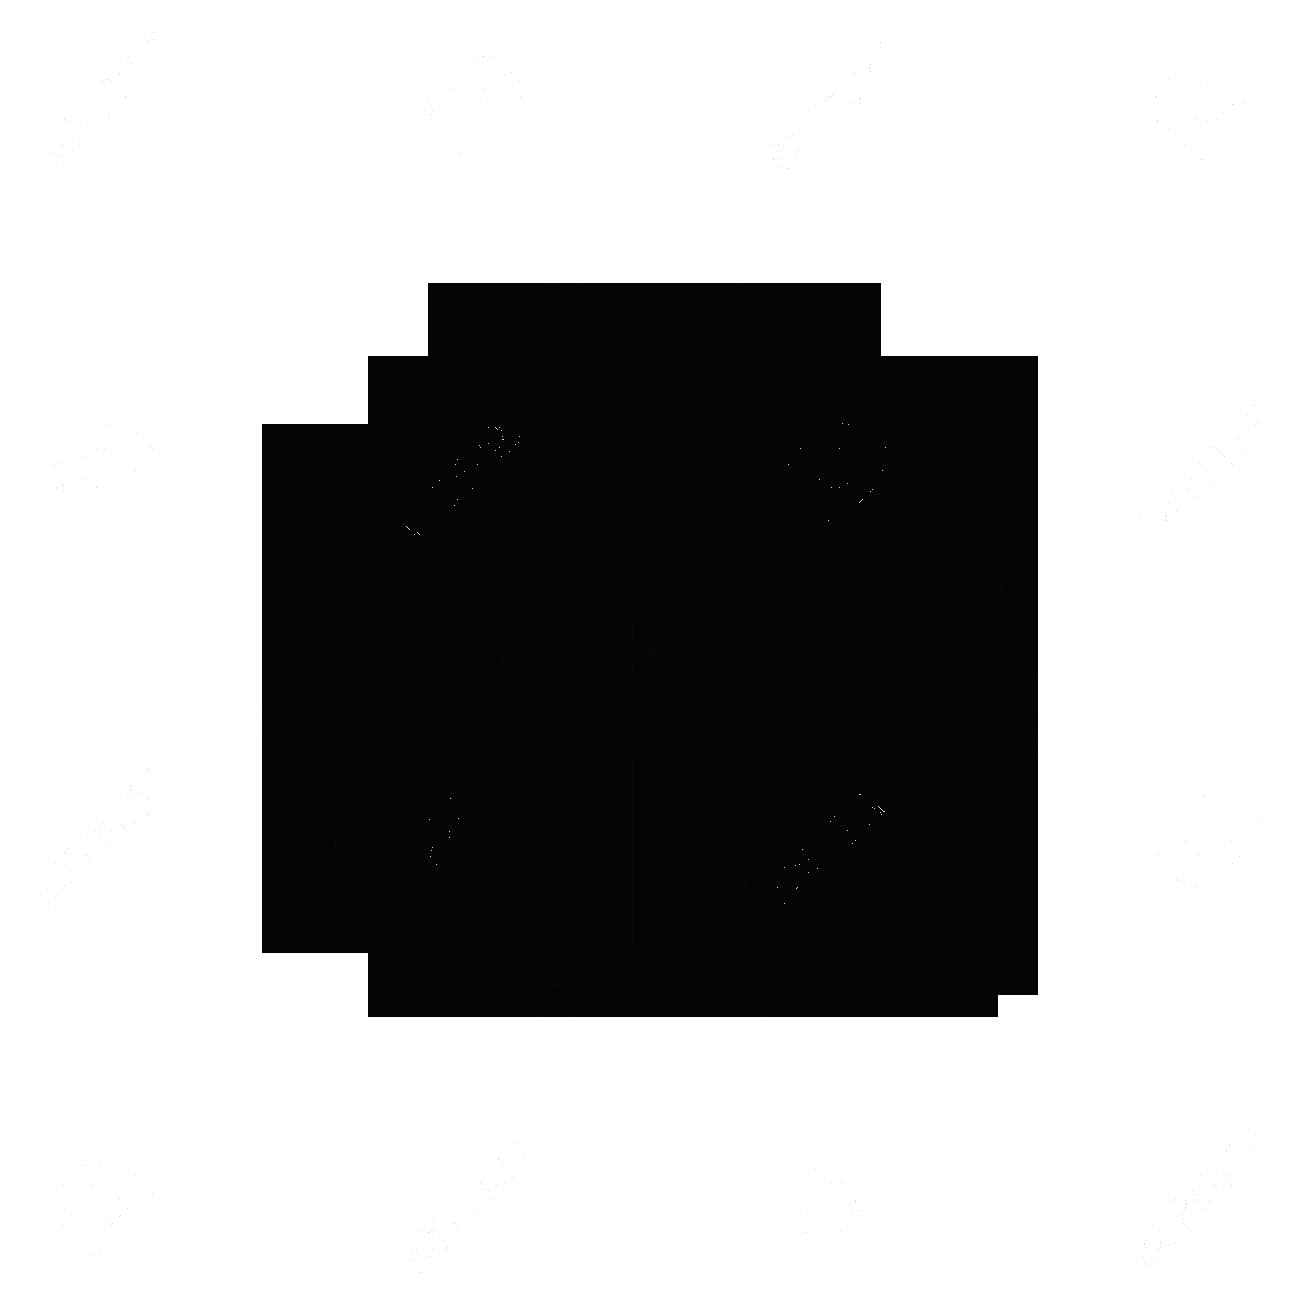 brain_icone_black